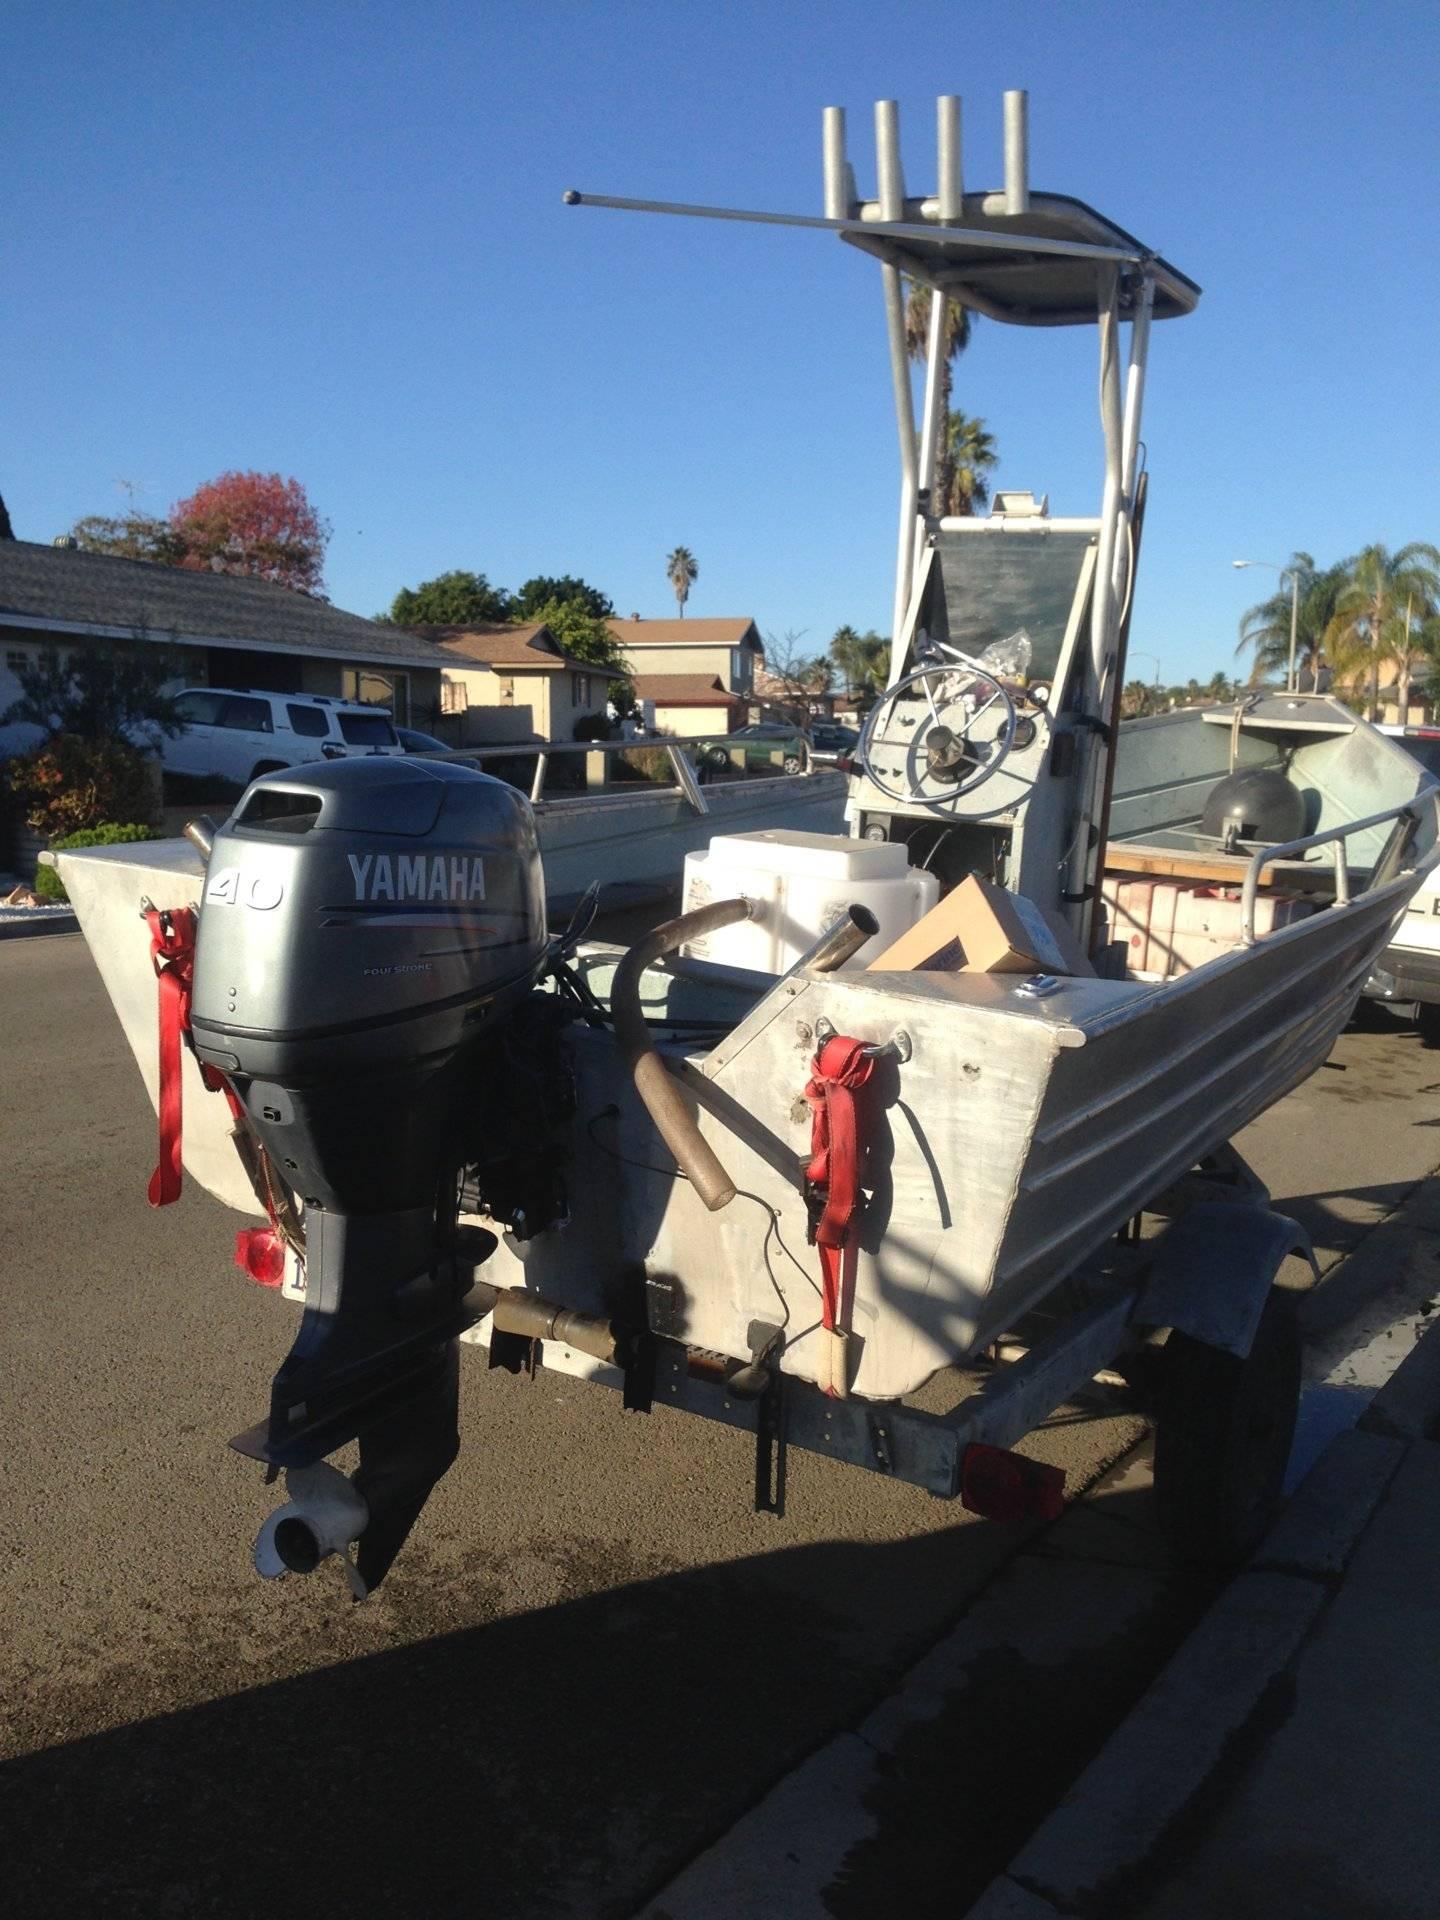 18 39 bayrunner w yamaha 40hp 4 stroke saltwater fishing for Yamaha escondido ca